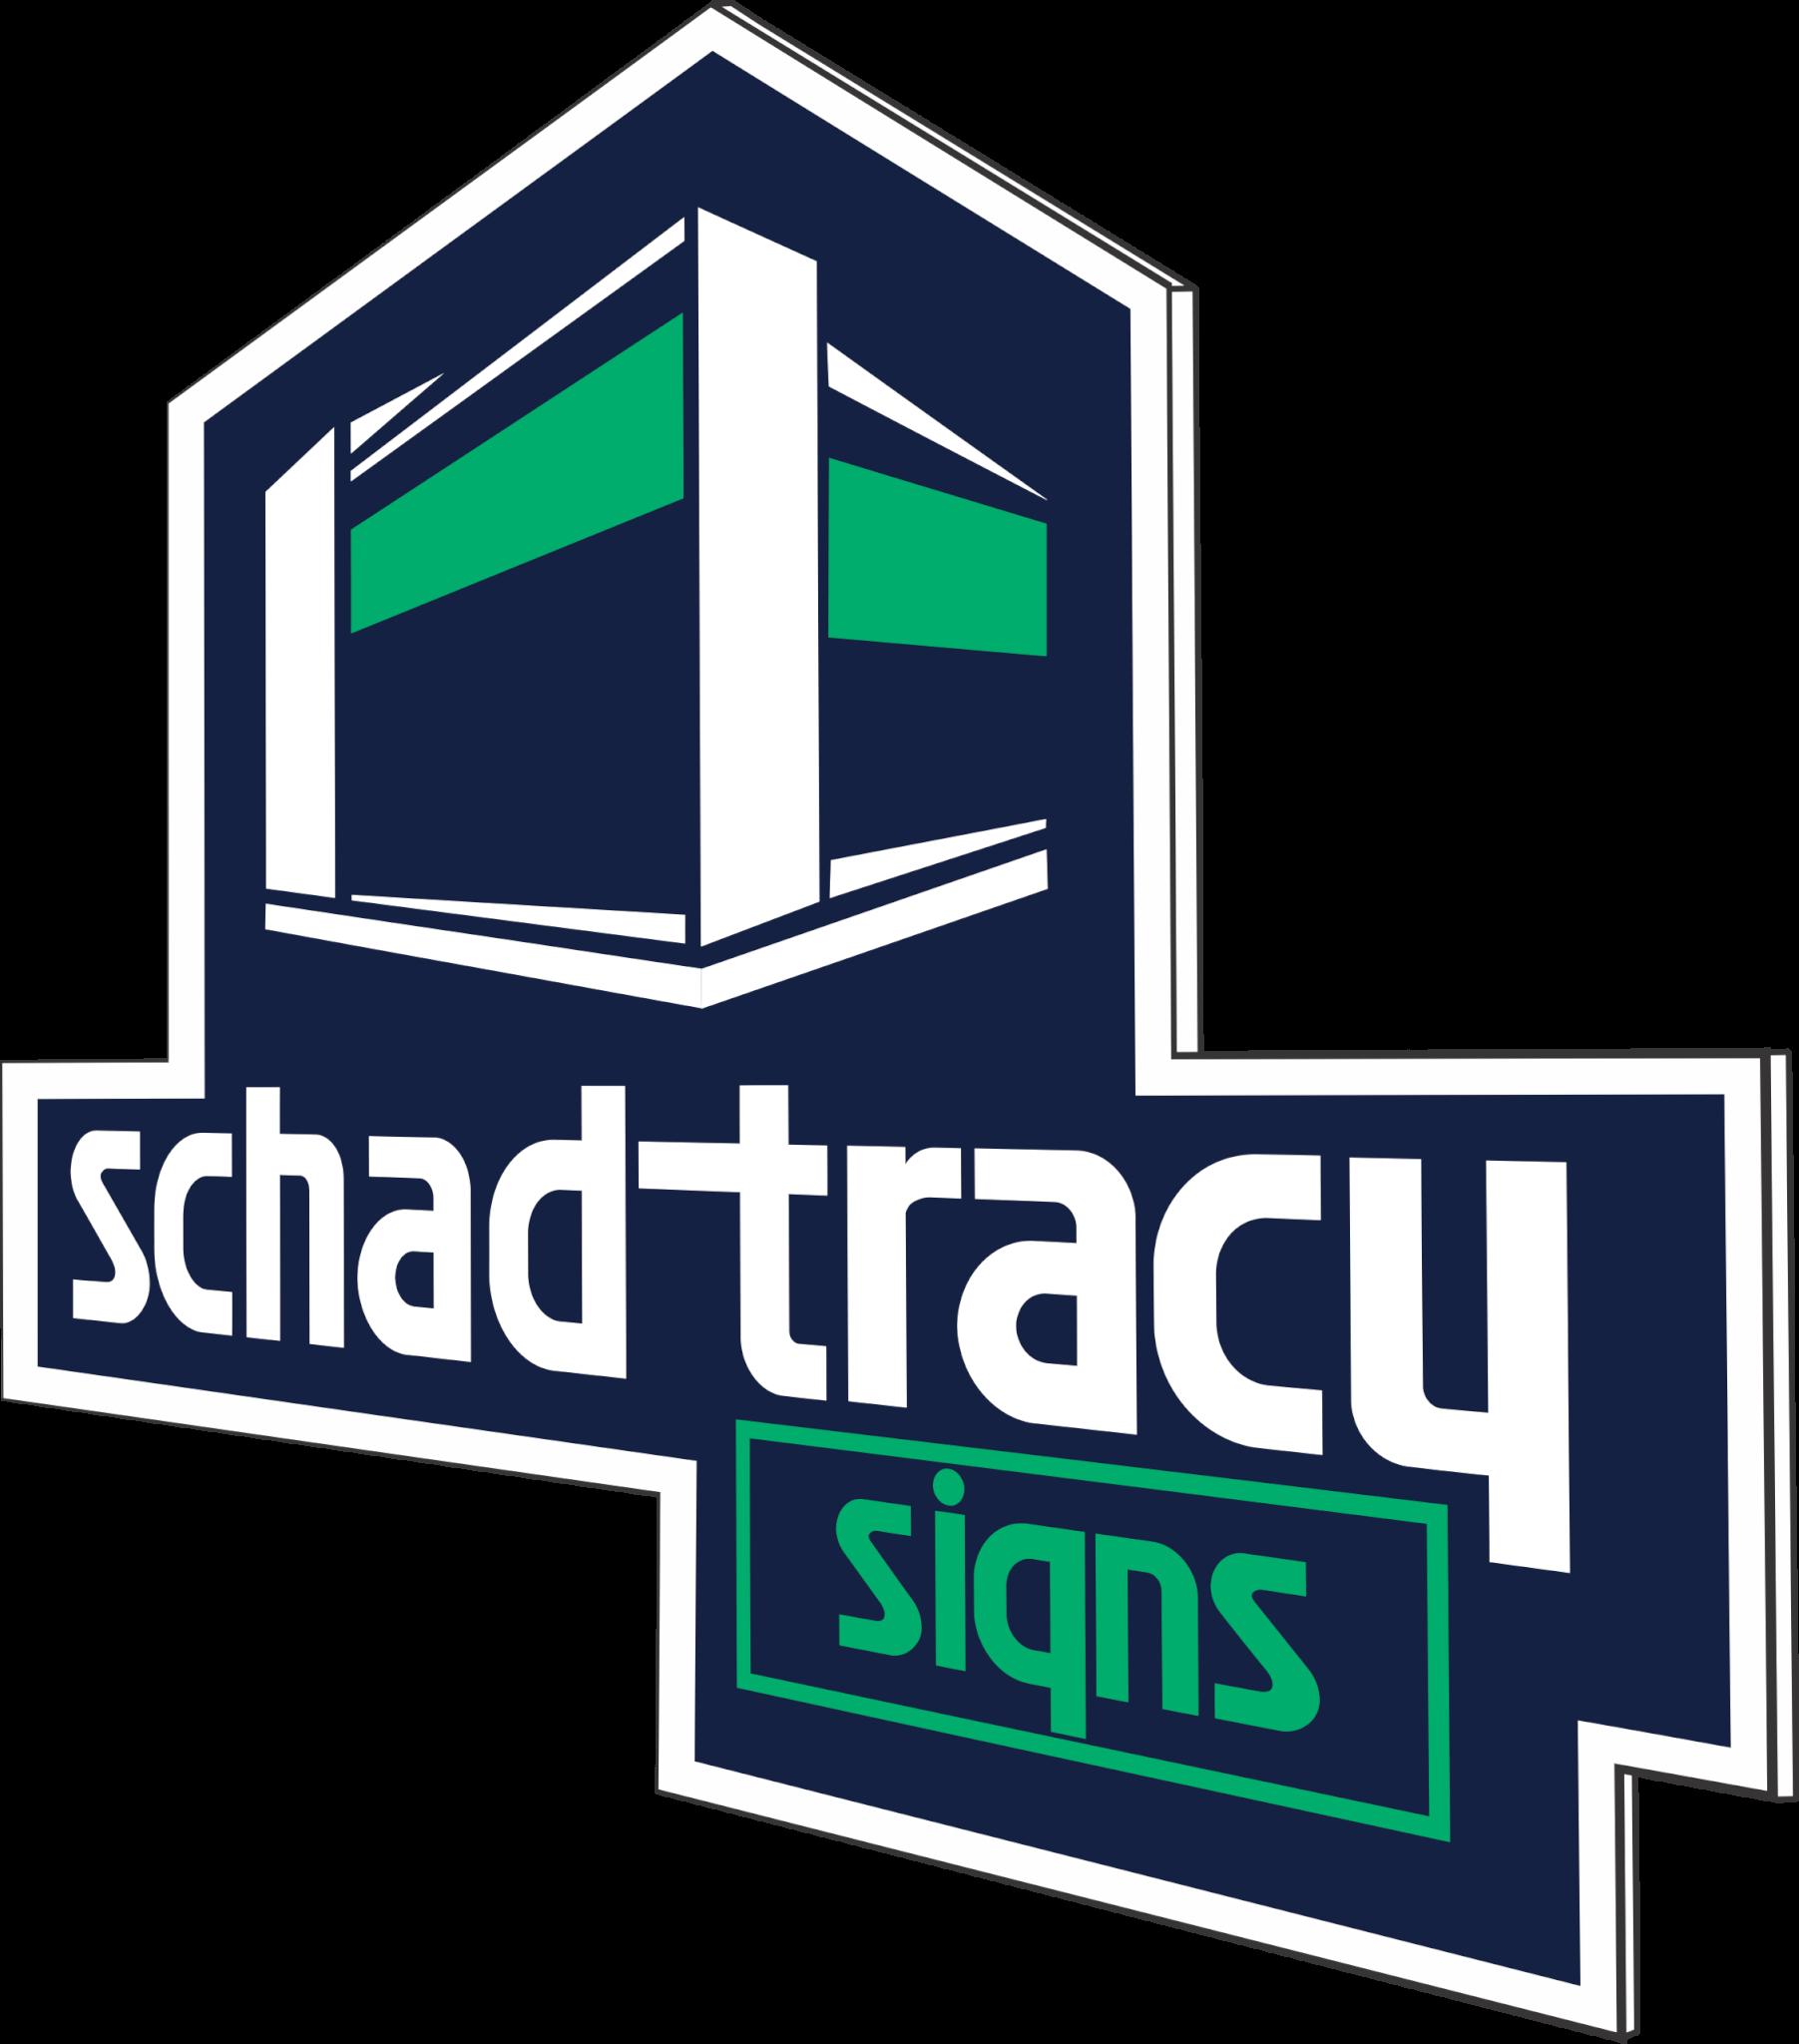 Schad Tracy Interior Signage